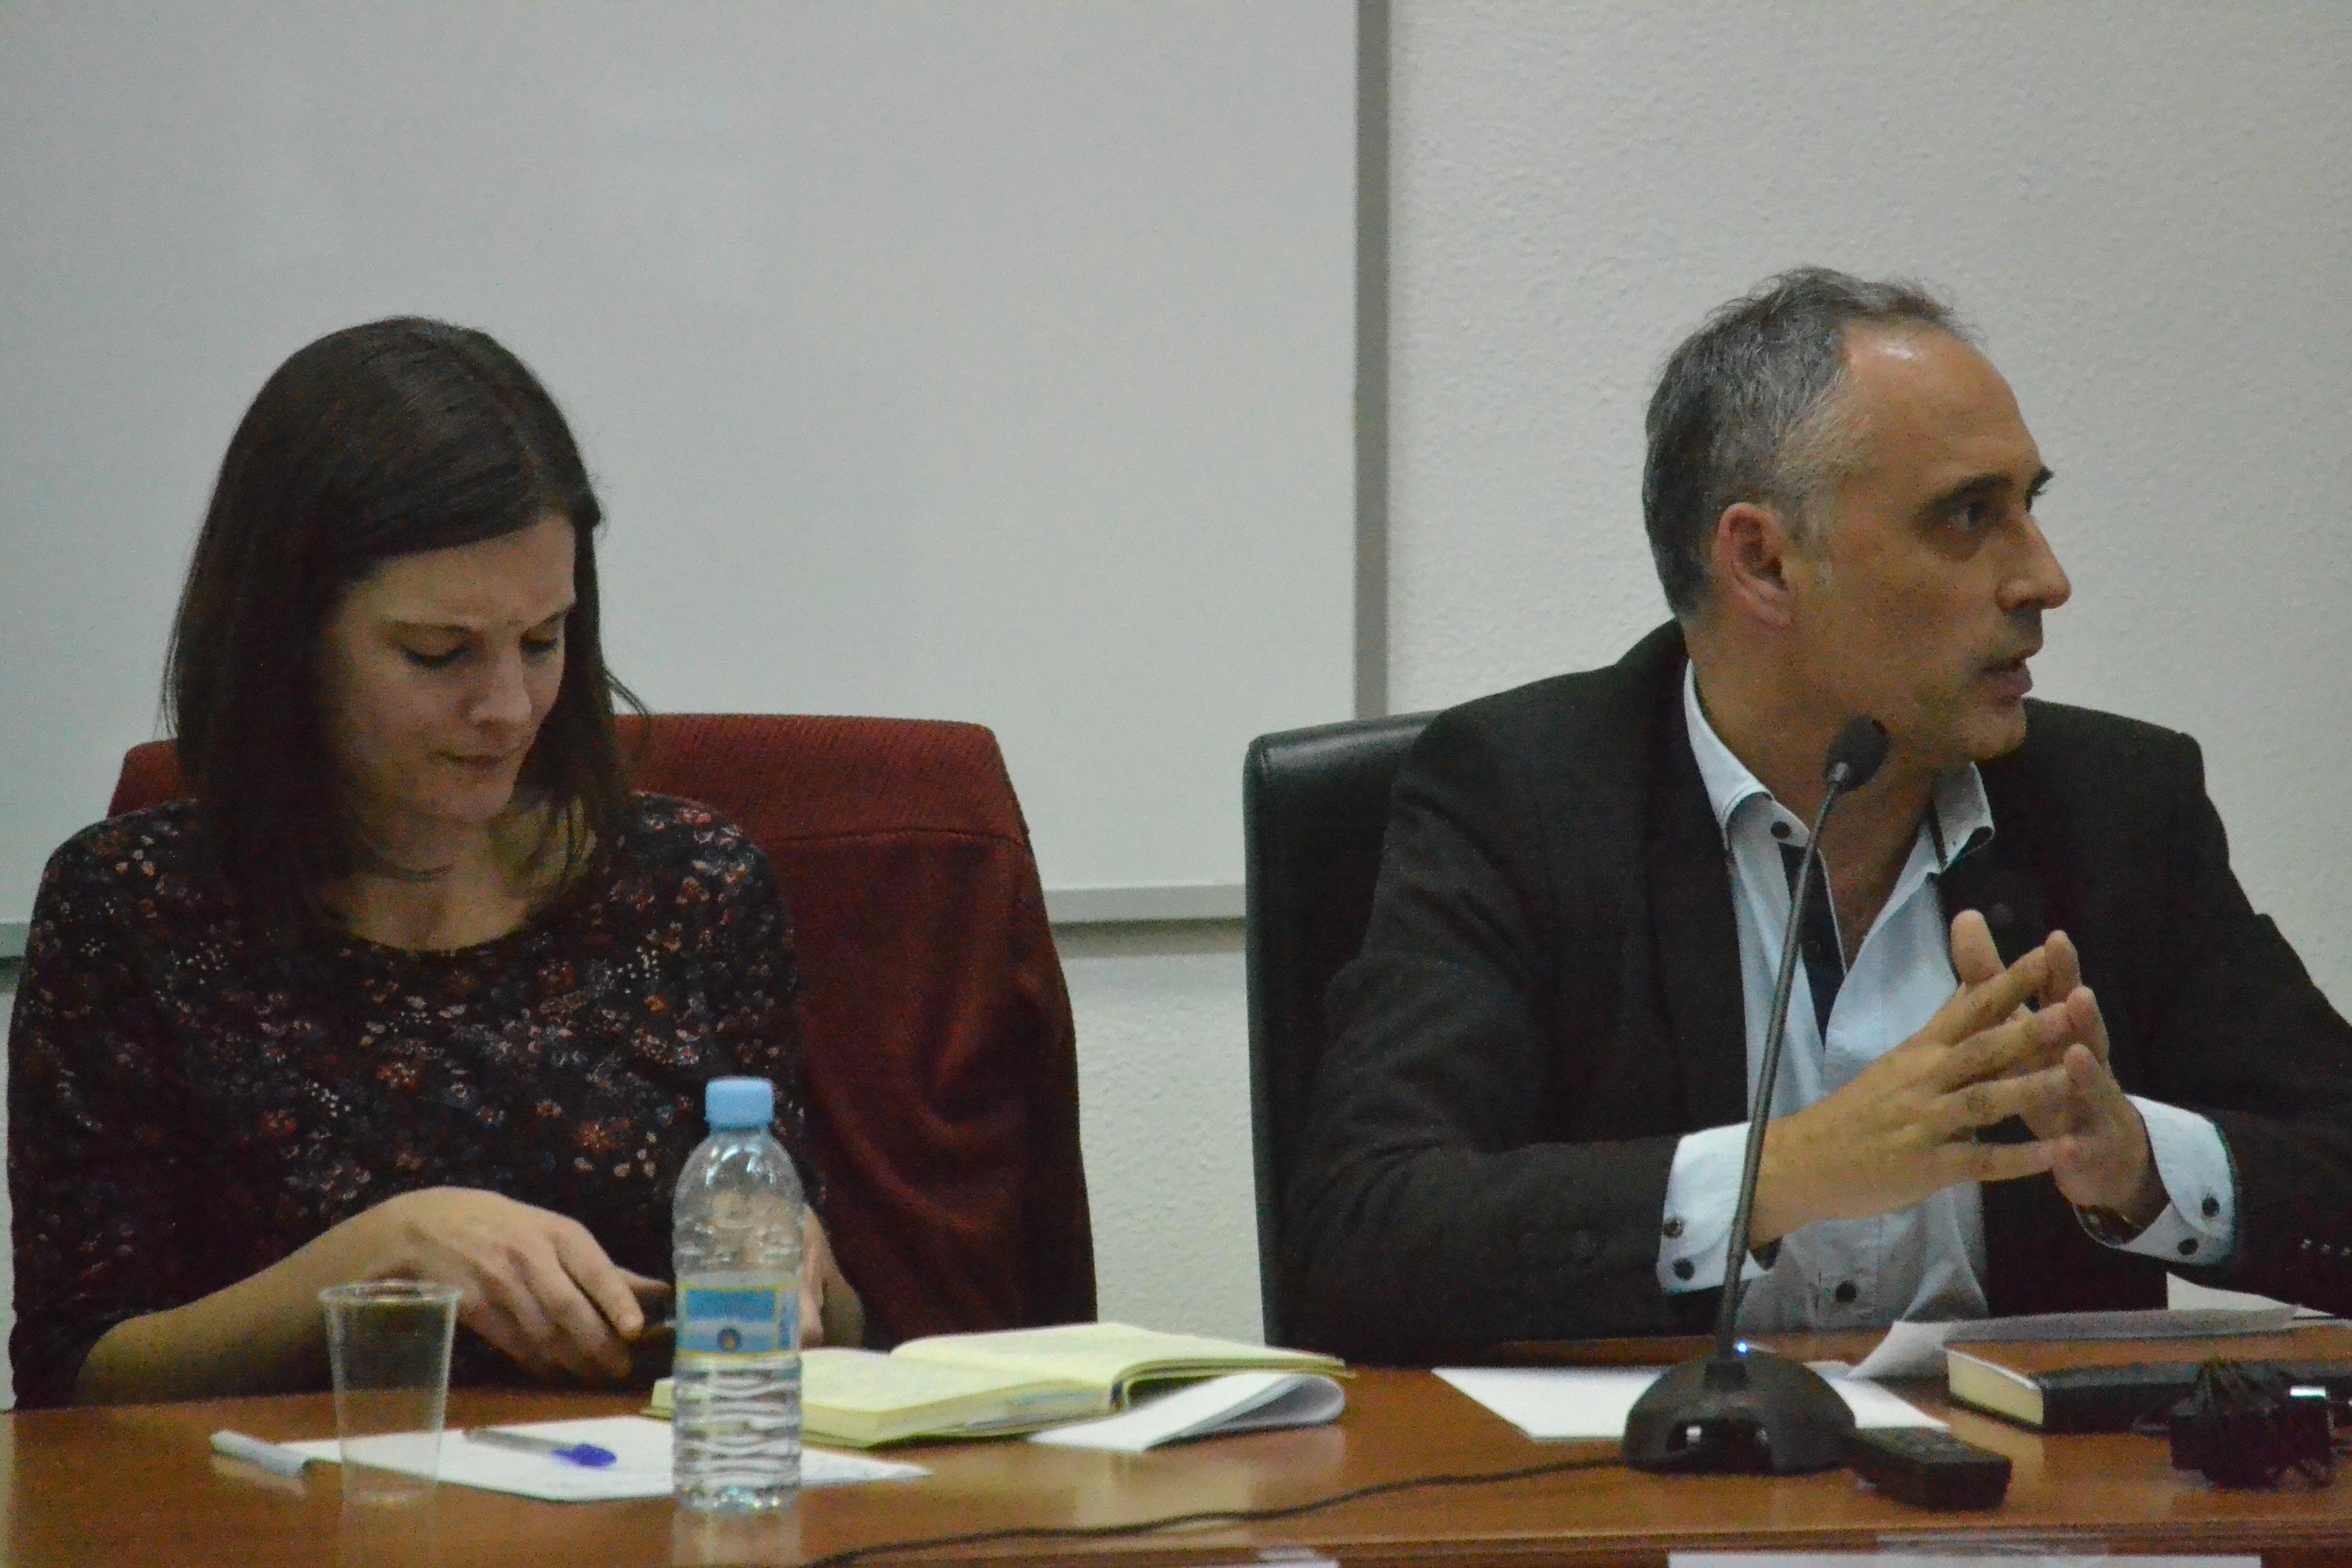 Olalla Rodil (esquerda) e Antonio Rodríguez (dereita) durante o debate © Carlos Rey